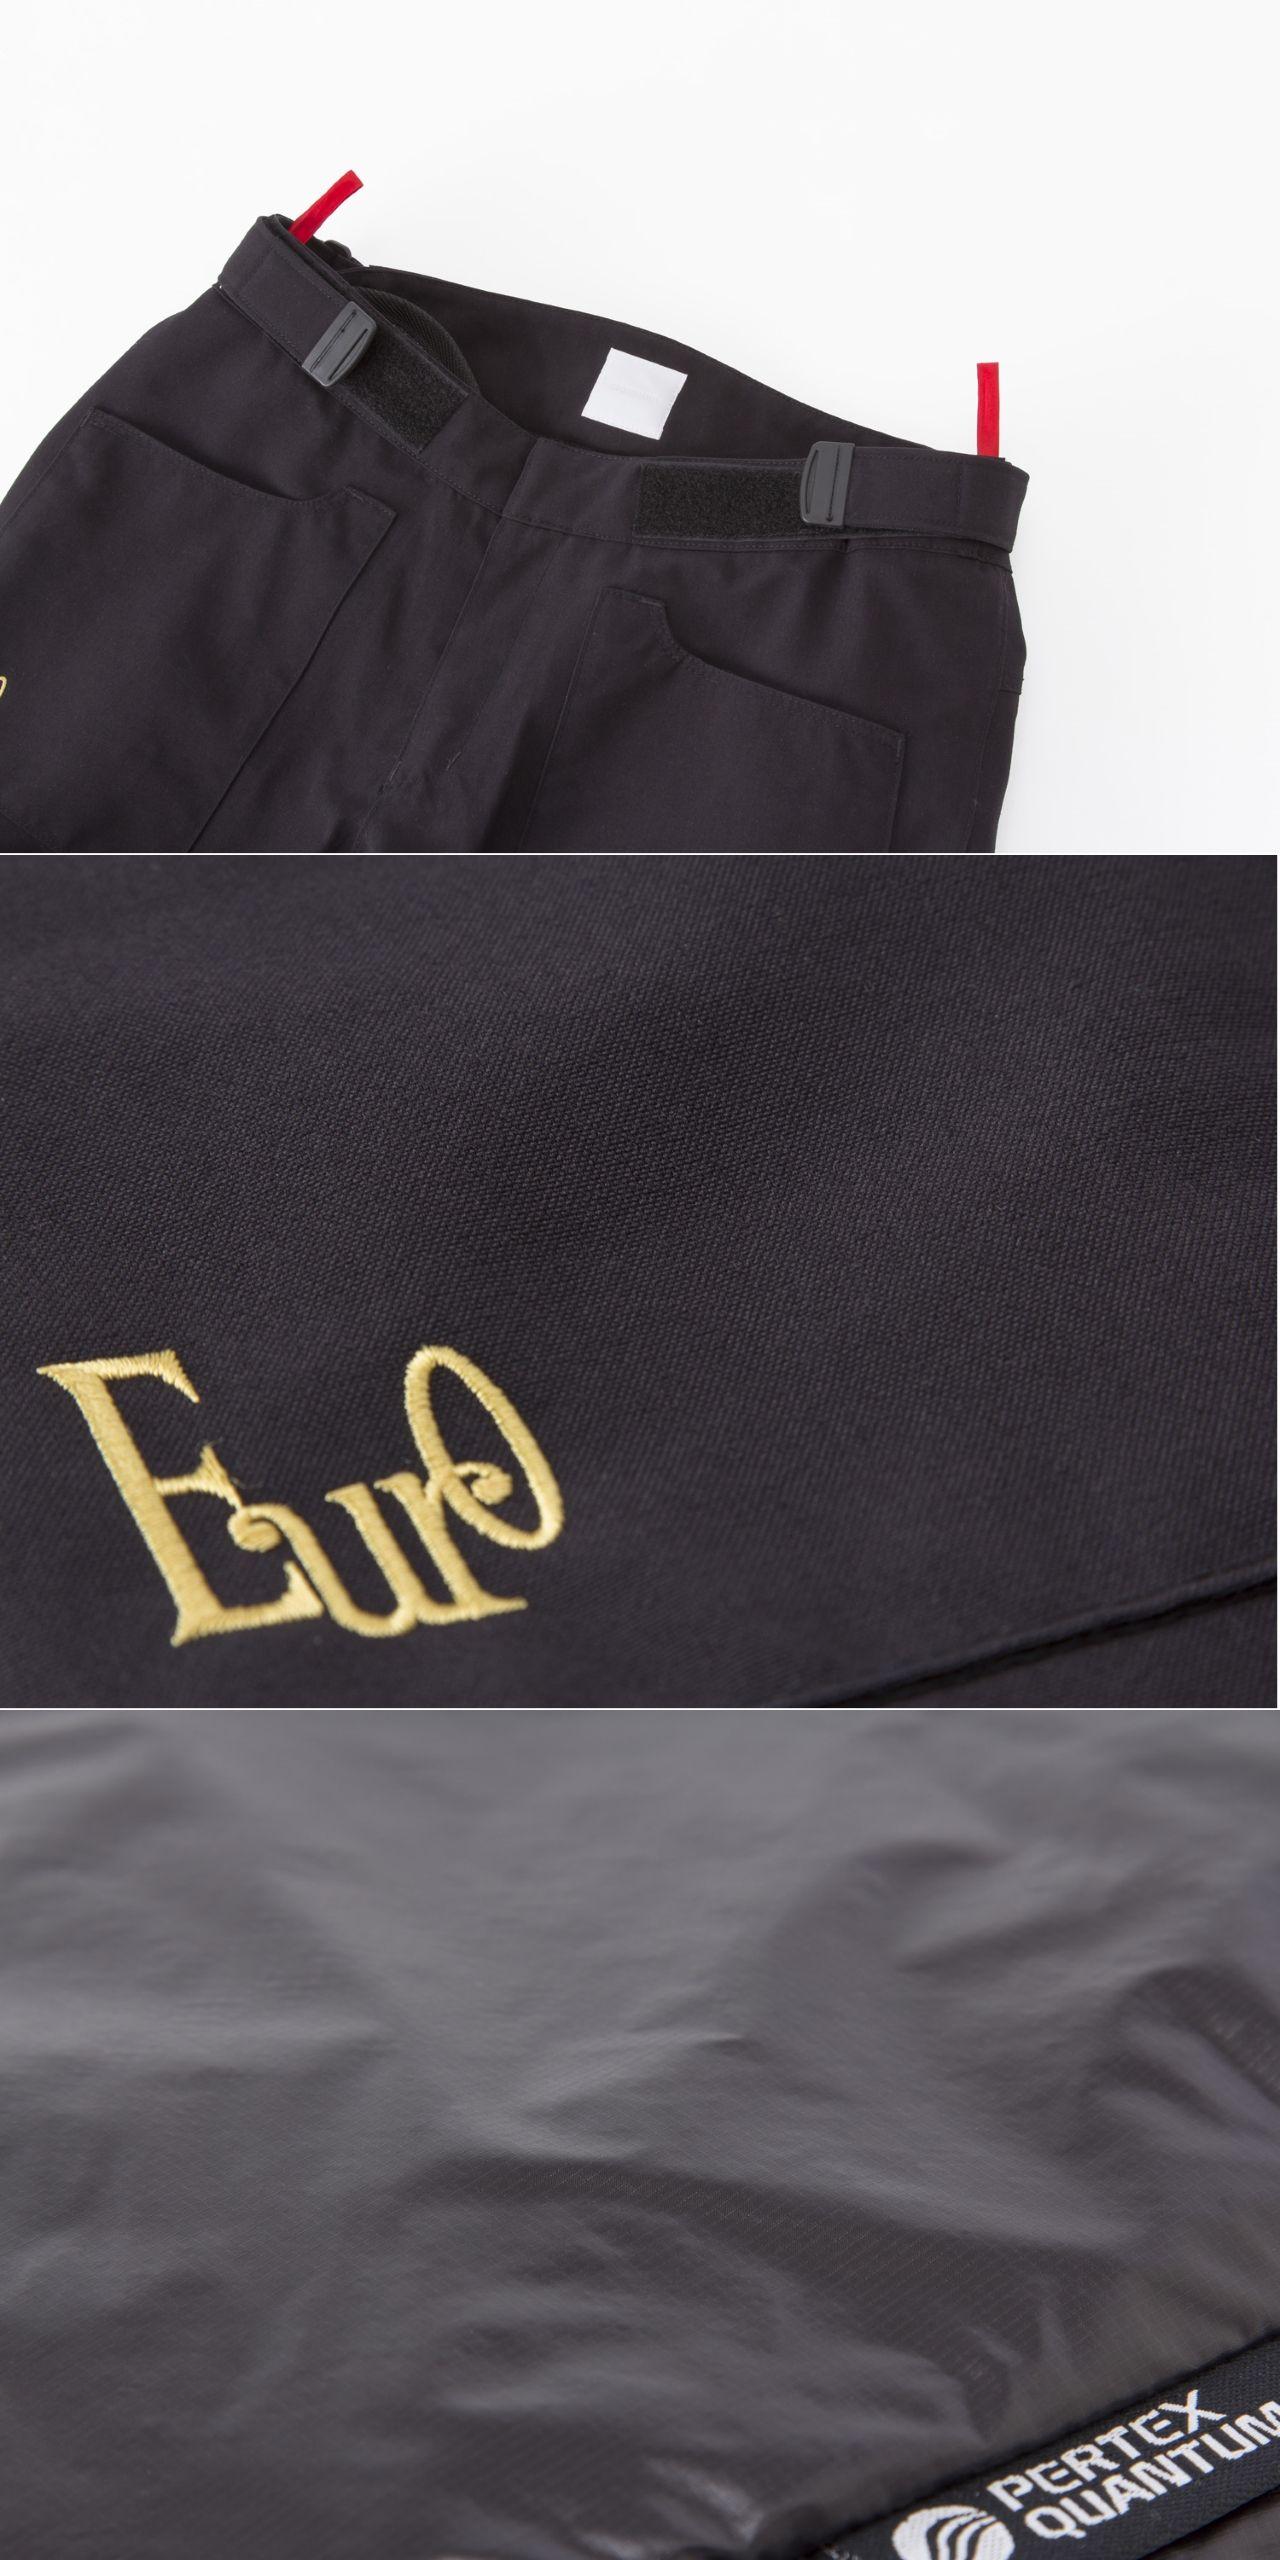 【GOLDWIN】EURO  Road Master車褲 GSM13450 - 「Webike-摩托百貨」